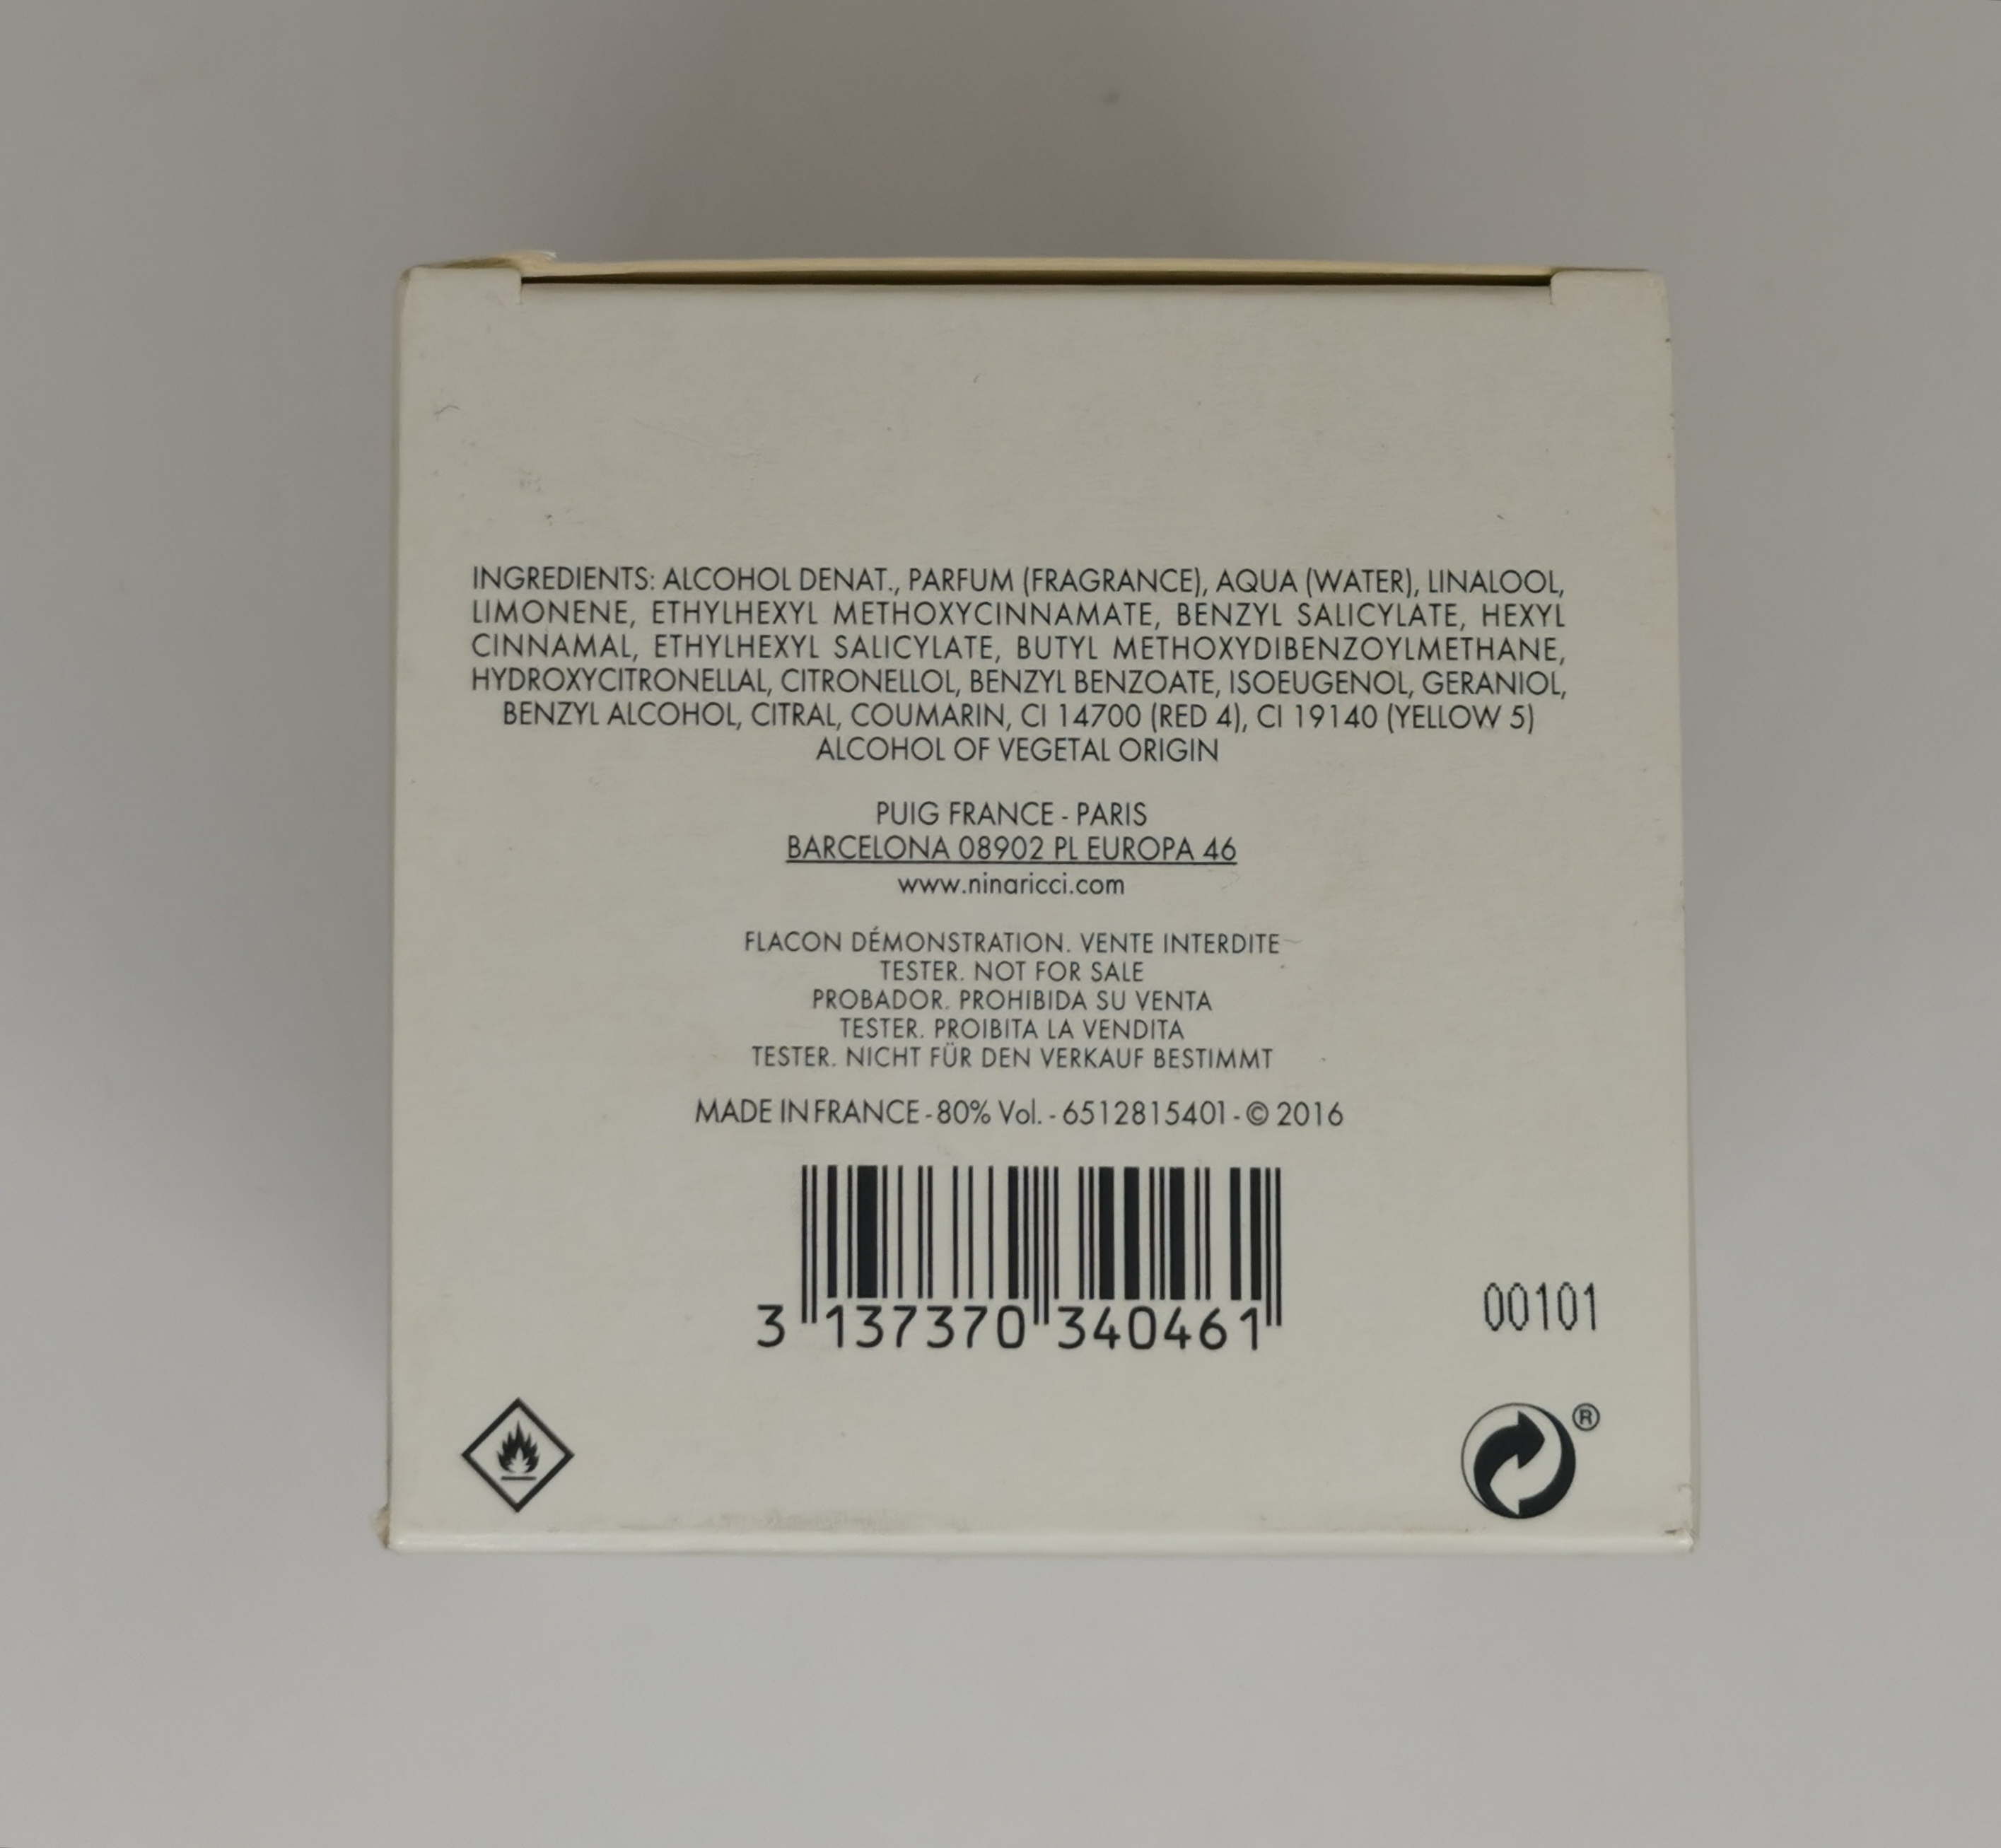 Парфюмерная вода (тестер) 100 мл Nina Ricci Premier Jour - фото штрих-кода и батч-кода на коробке